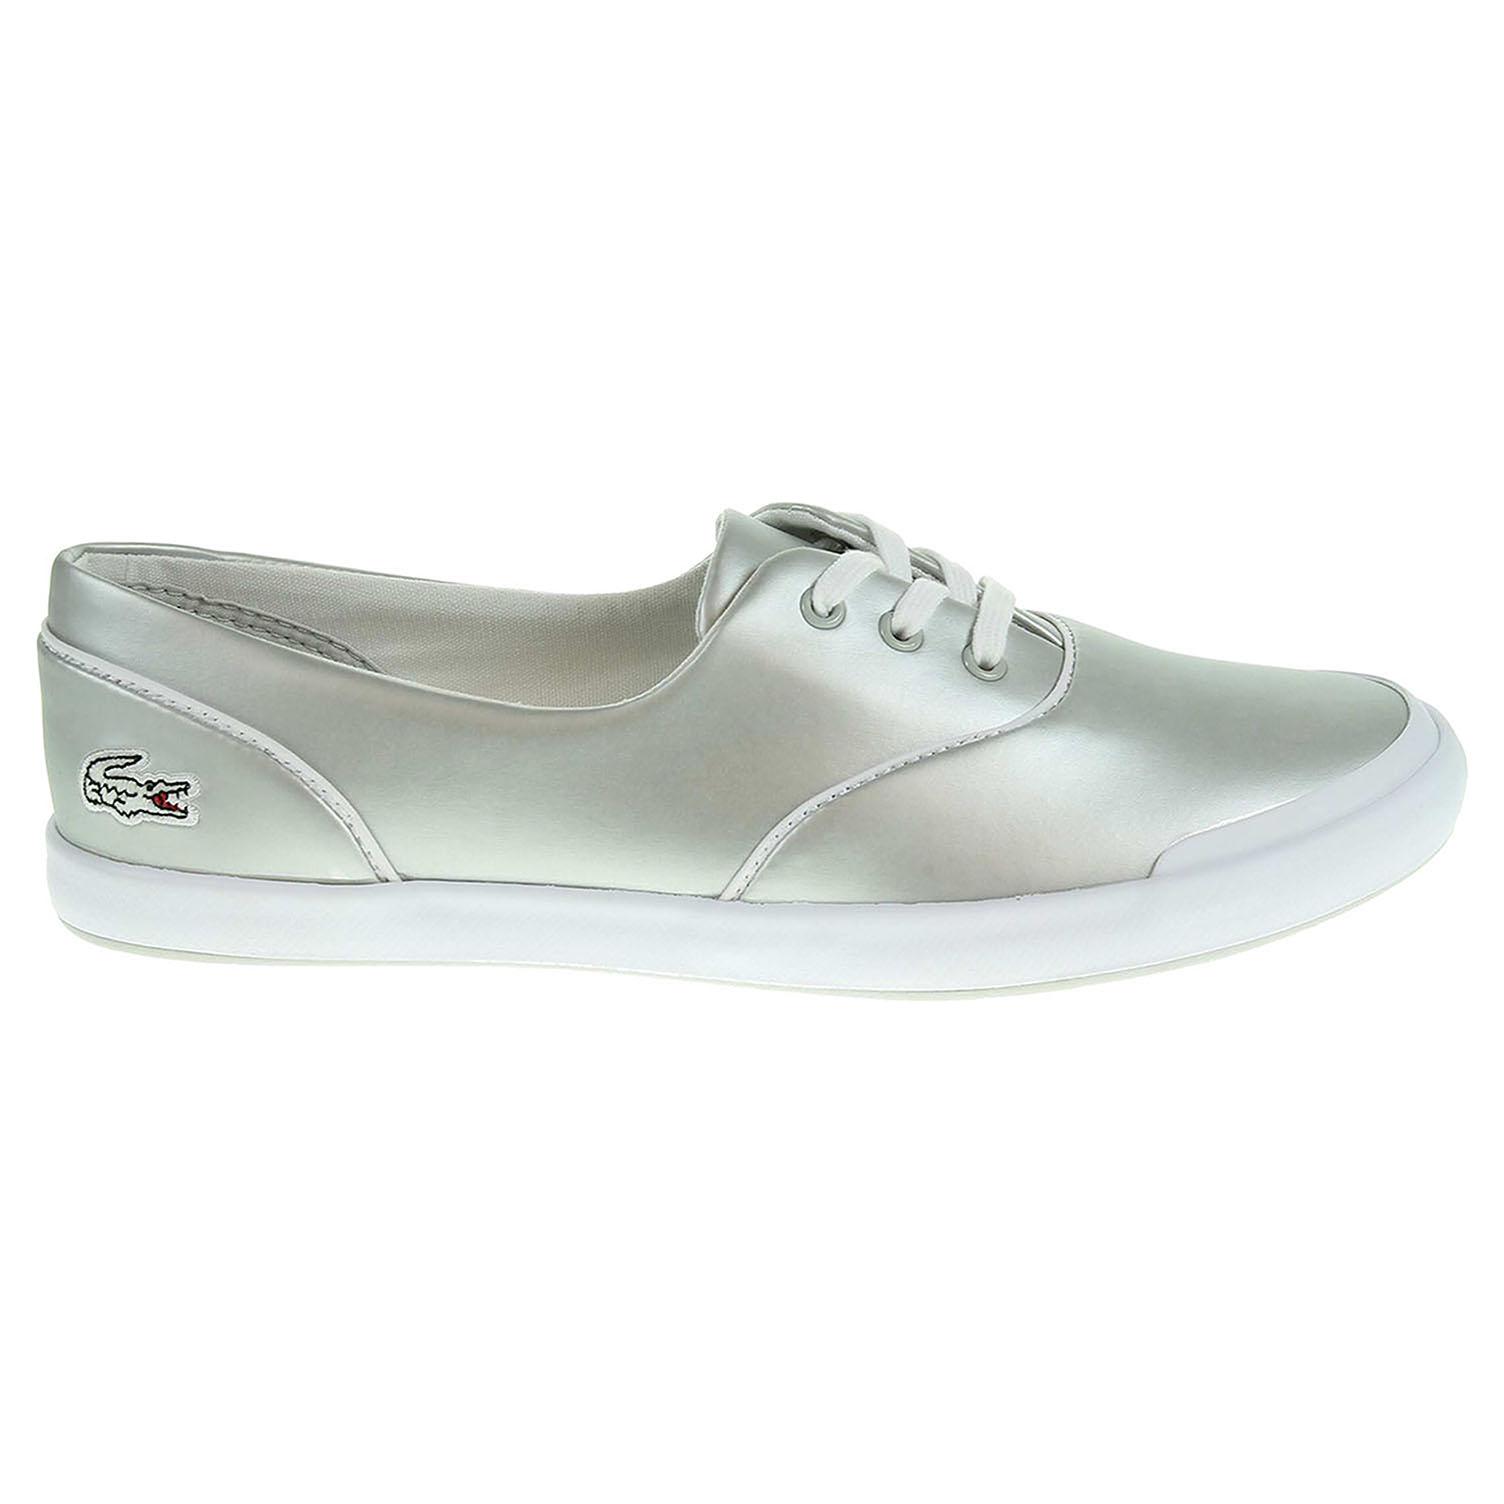 563c2c0b8ed Ecco Lacoste Lancelle 3 Eye dámská obuv stříbrná 23200700